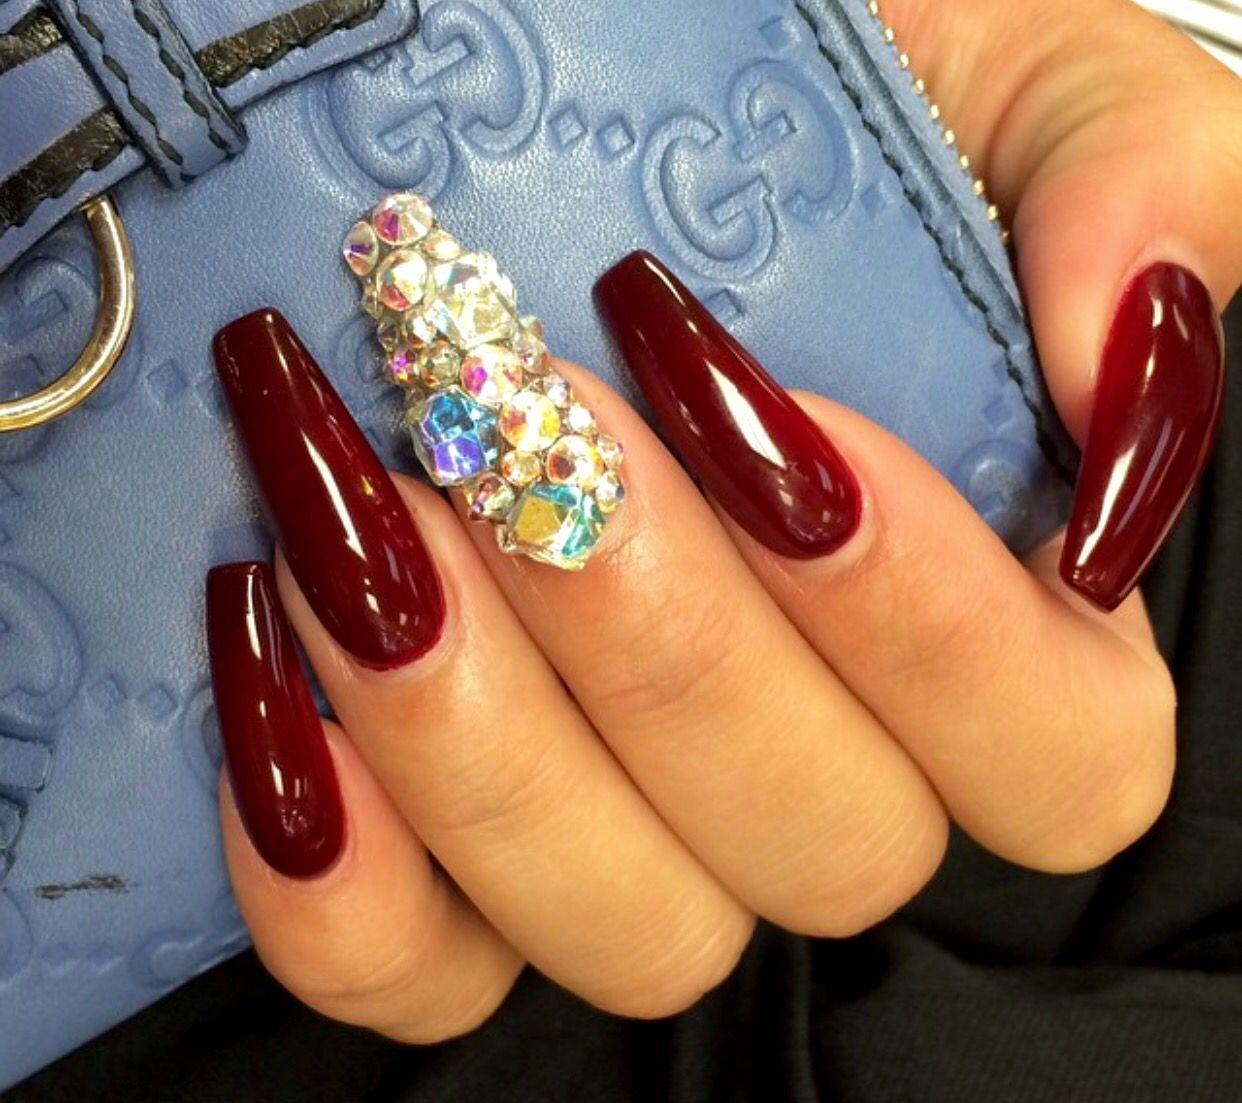 Pin by Jalapeño on Nails | Pinterest | Nail nail, Coffin nails and ...